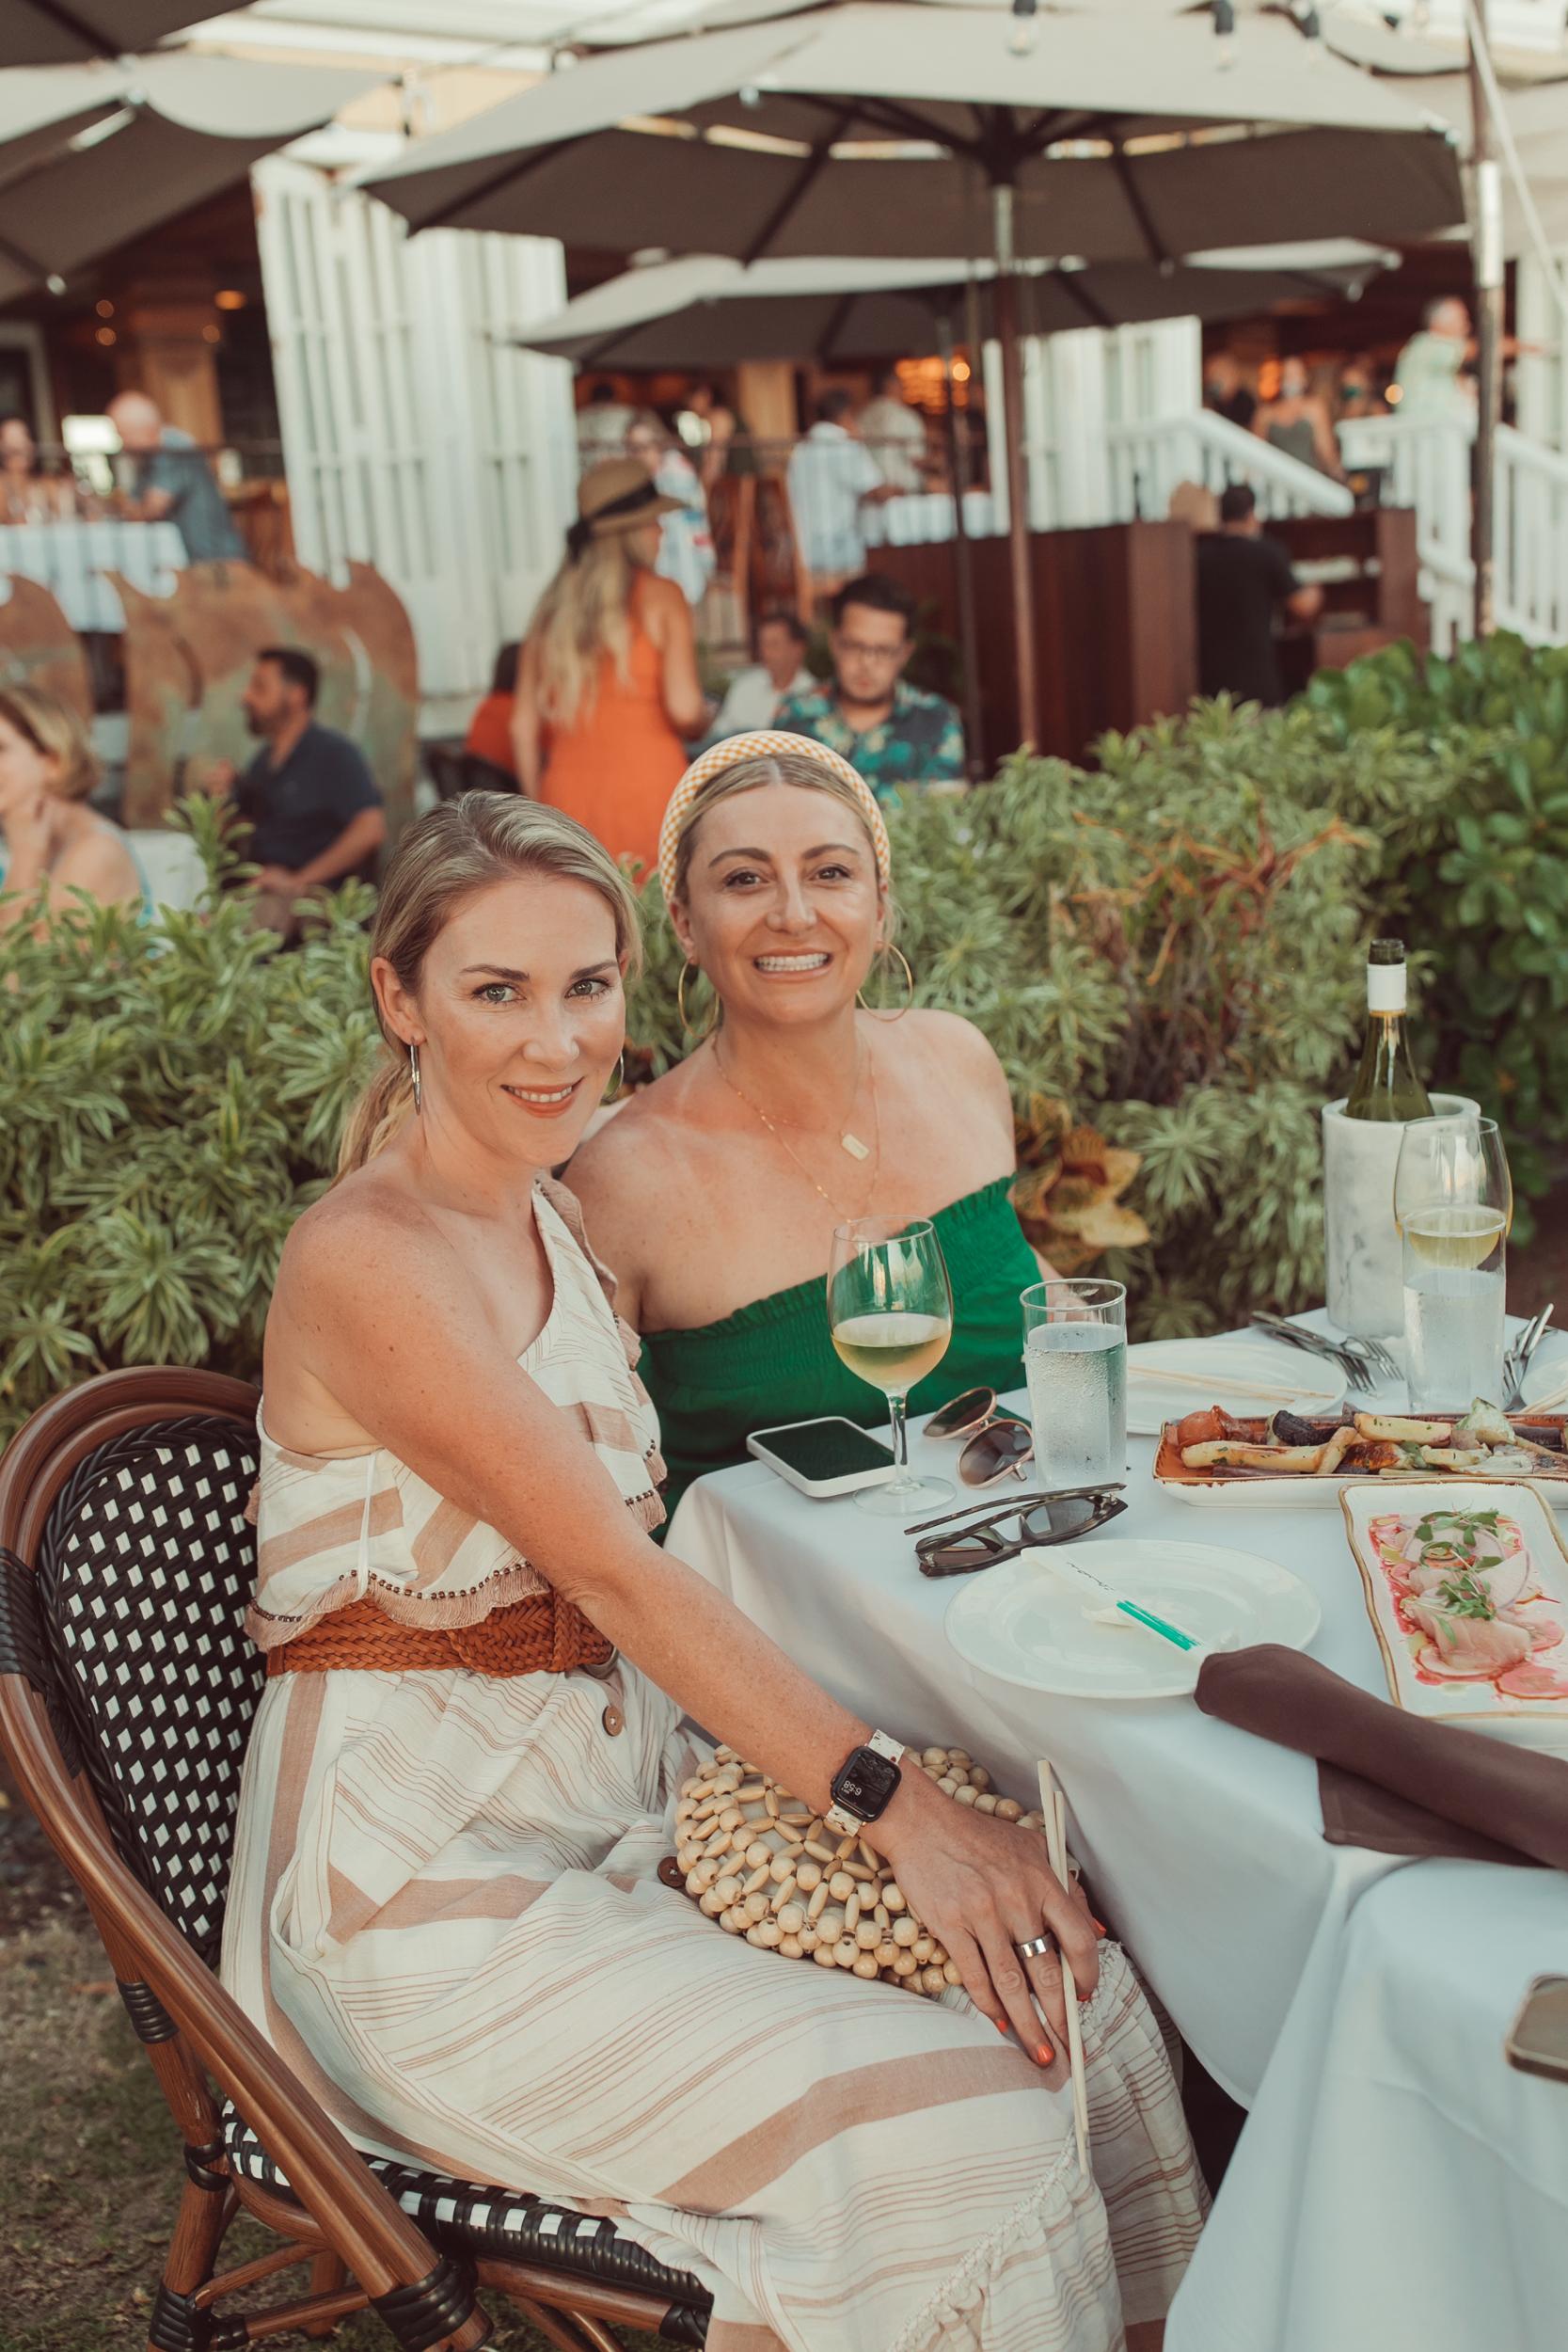 friends at outdoor restaurant